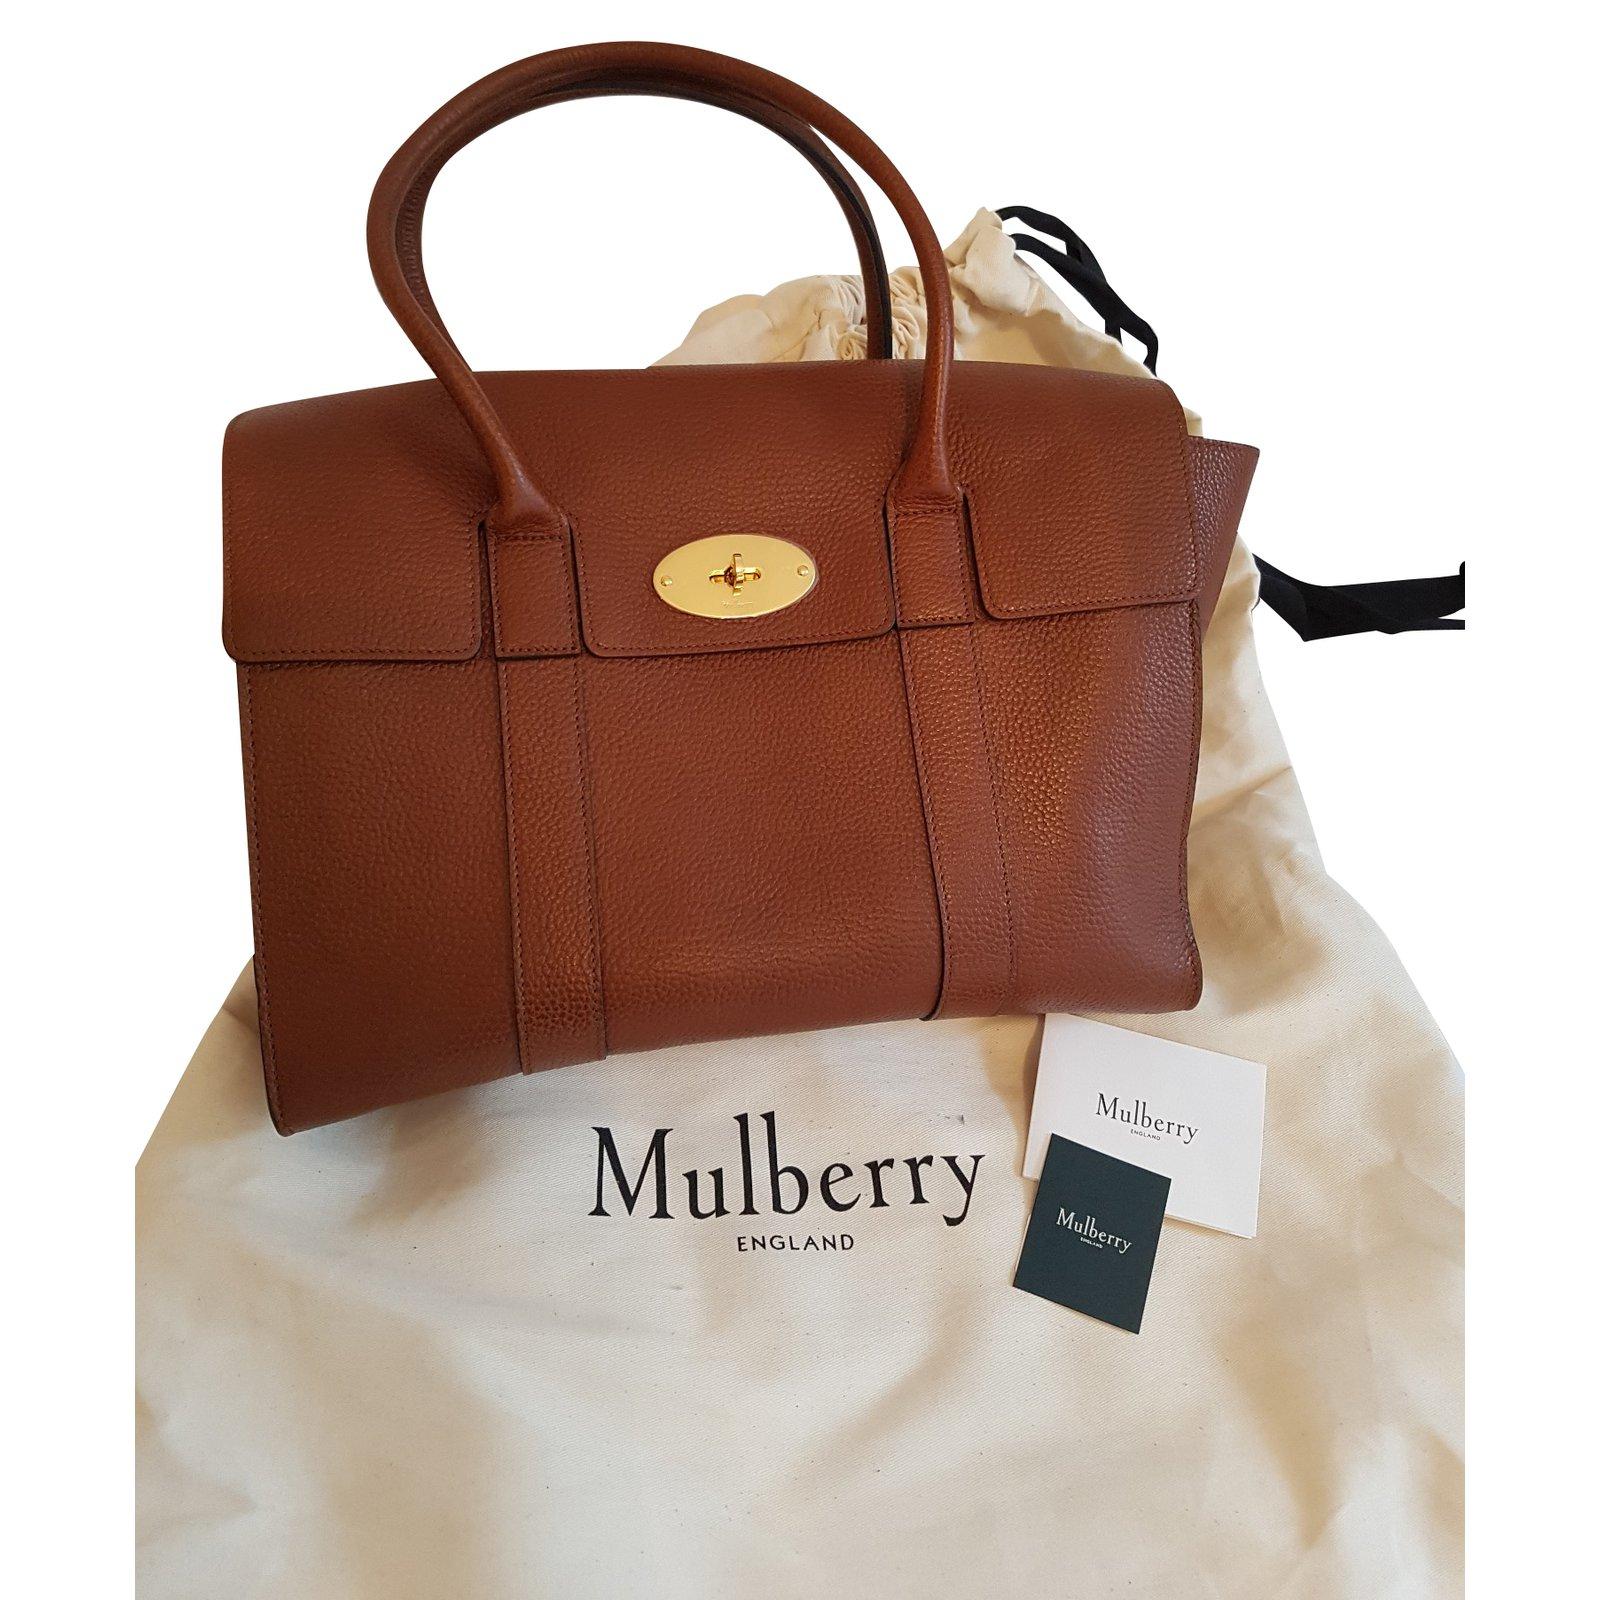 dfe9af844194 Mulberry Bayswater Handbags Leather Brown ref.50187 - Joli .